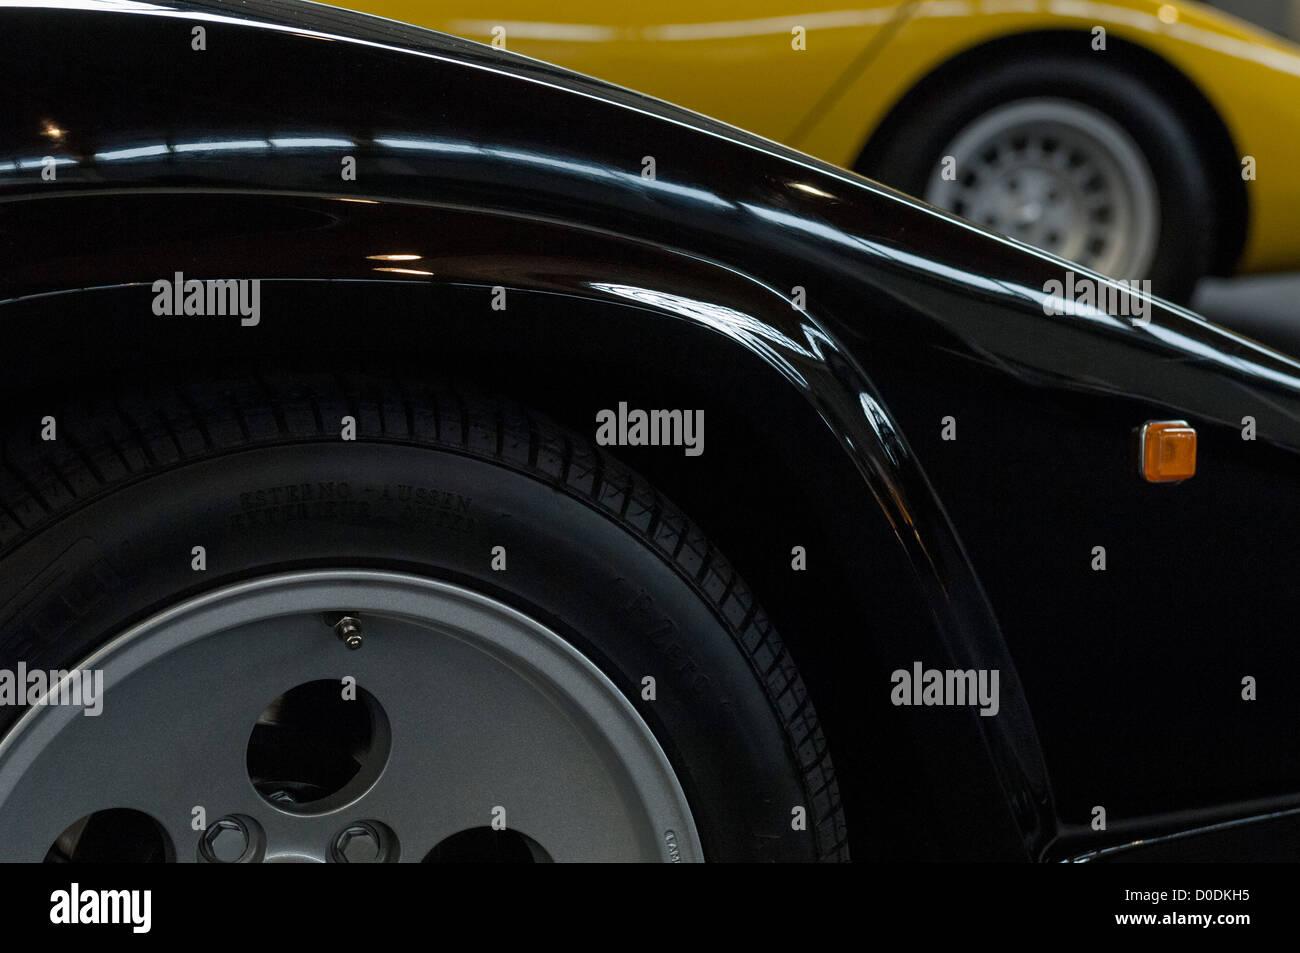 Two Lamborghini Countach Sportscars Black And Yellow Stock Photo